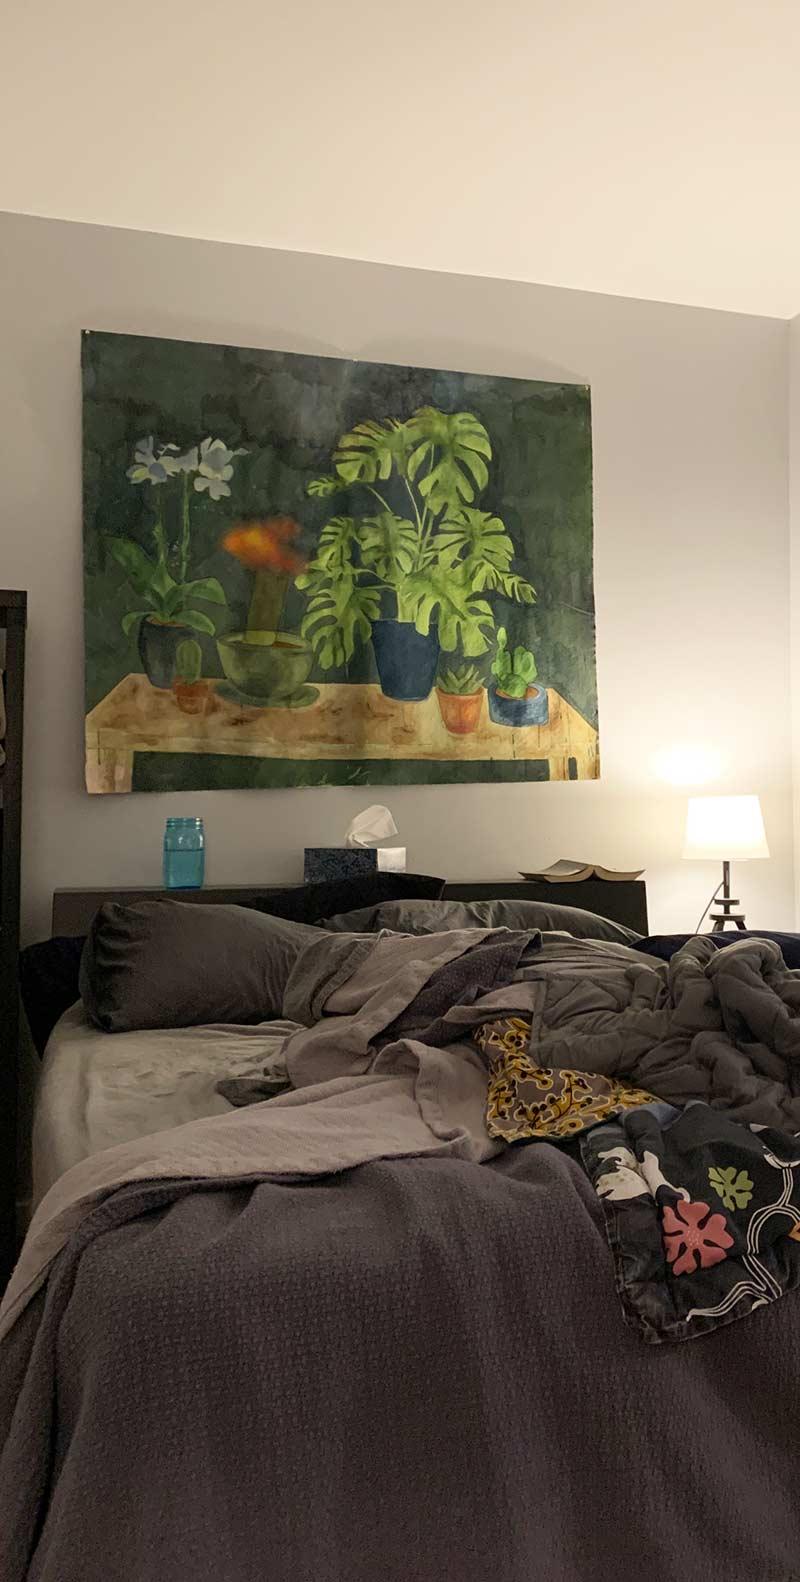 Table garden hanging in the bedroom. of the artist, Jana Rumberger